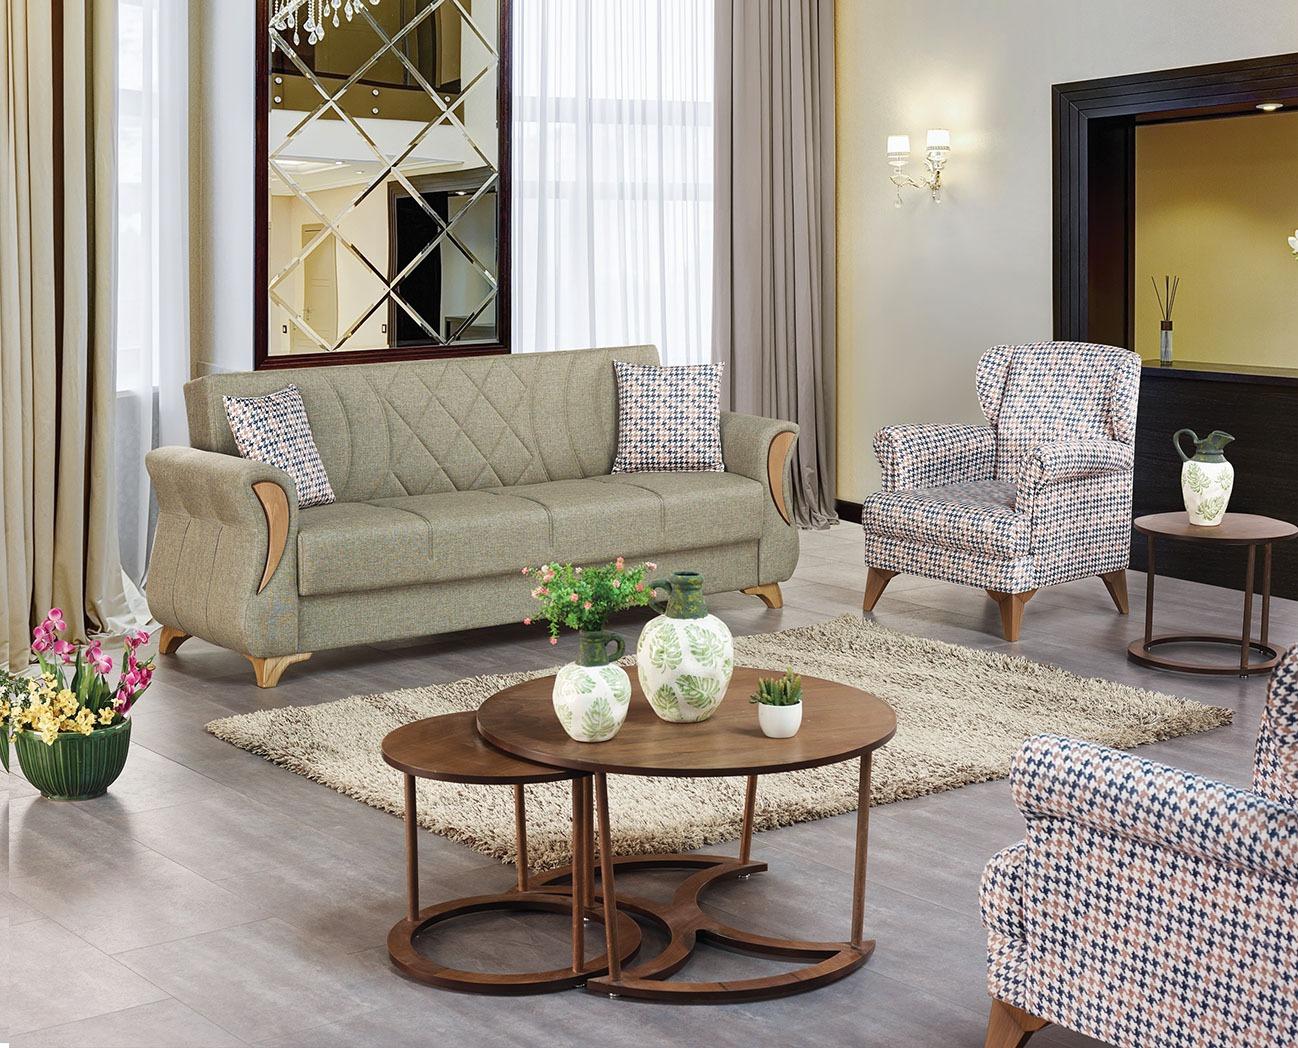 Full Size of Couch Garnitur Ikea Sofa Garnituren 3 2 1 Kasper Wohndesign Leder 3 Teilig 3 2 Echtleder Gebraucht Sofa Garnitur 3/2/1 Eiche Massivholz 2 Hersteller Poco Sofa Sofa Garnitur